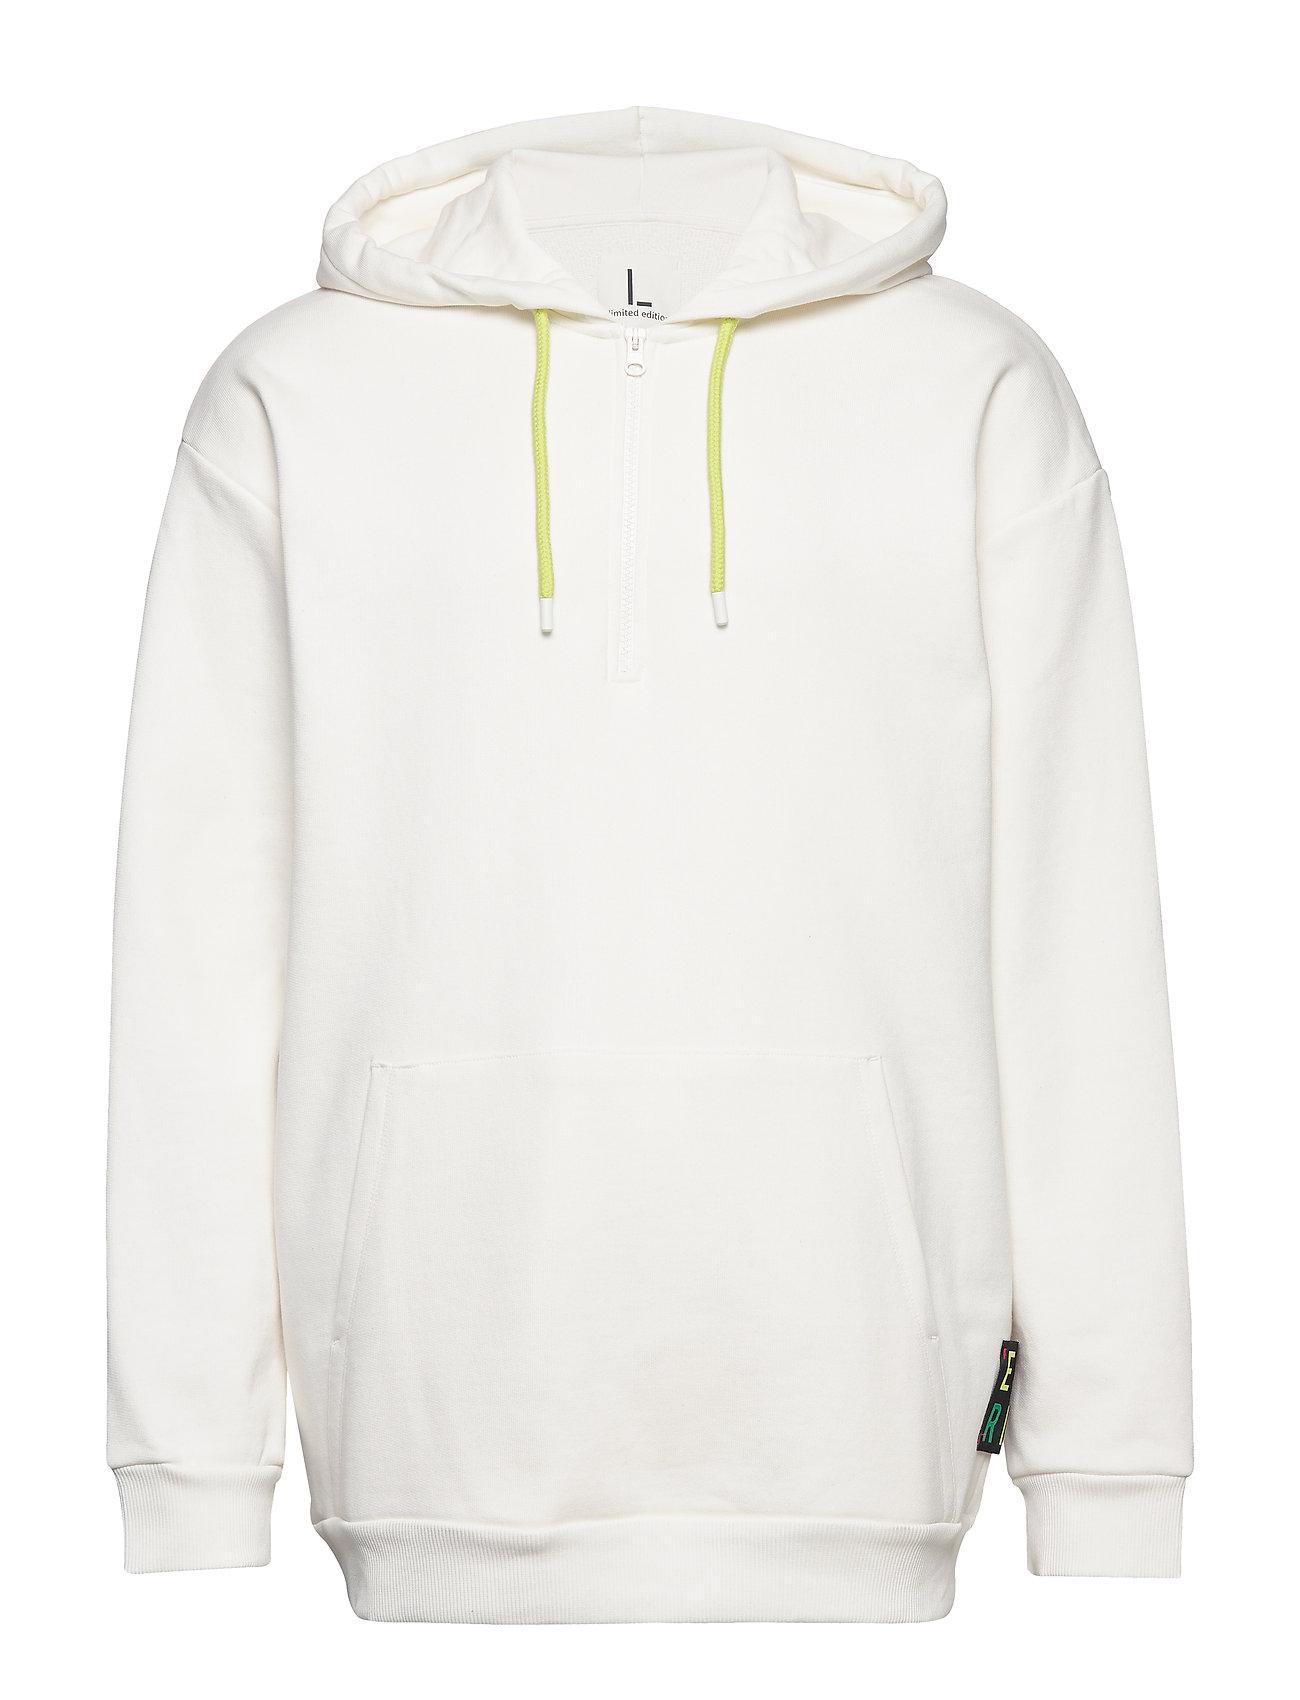 Esprit Casual Sweatshirts - OFF WHITE